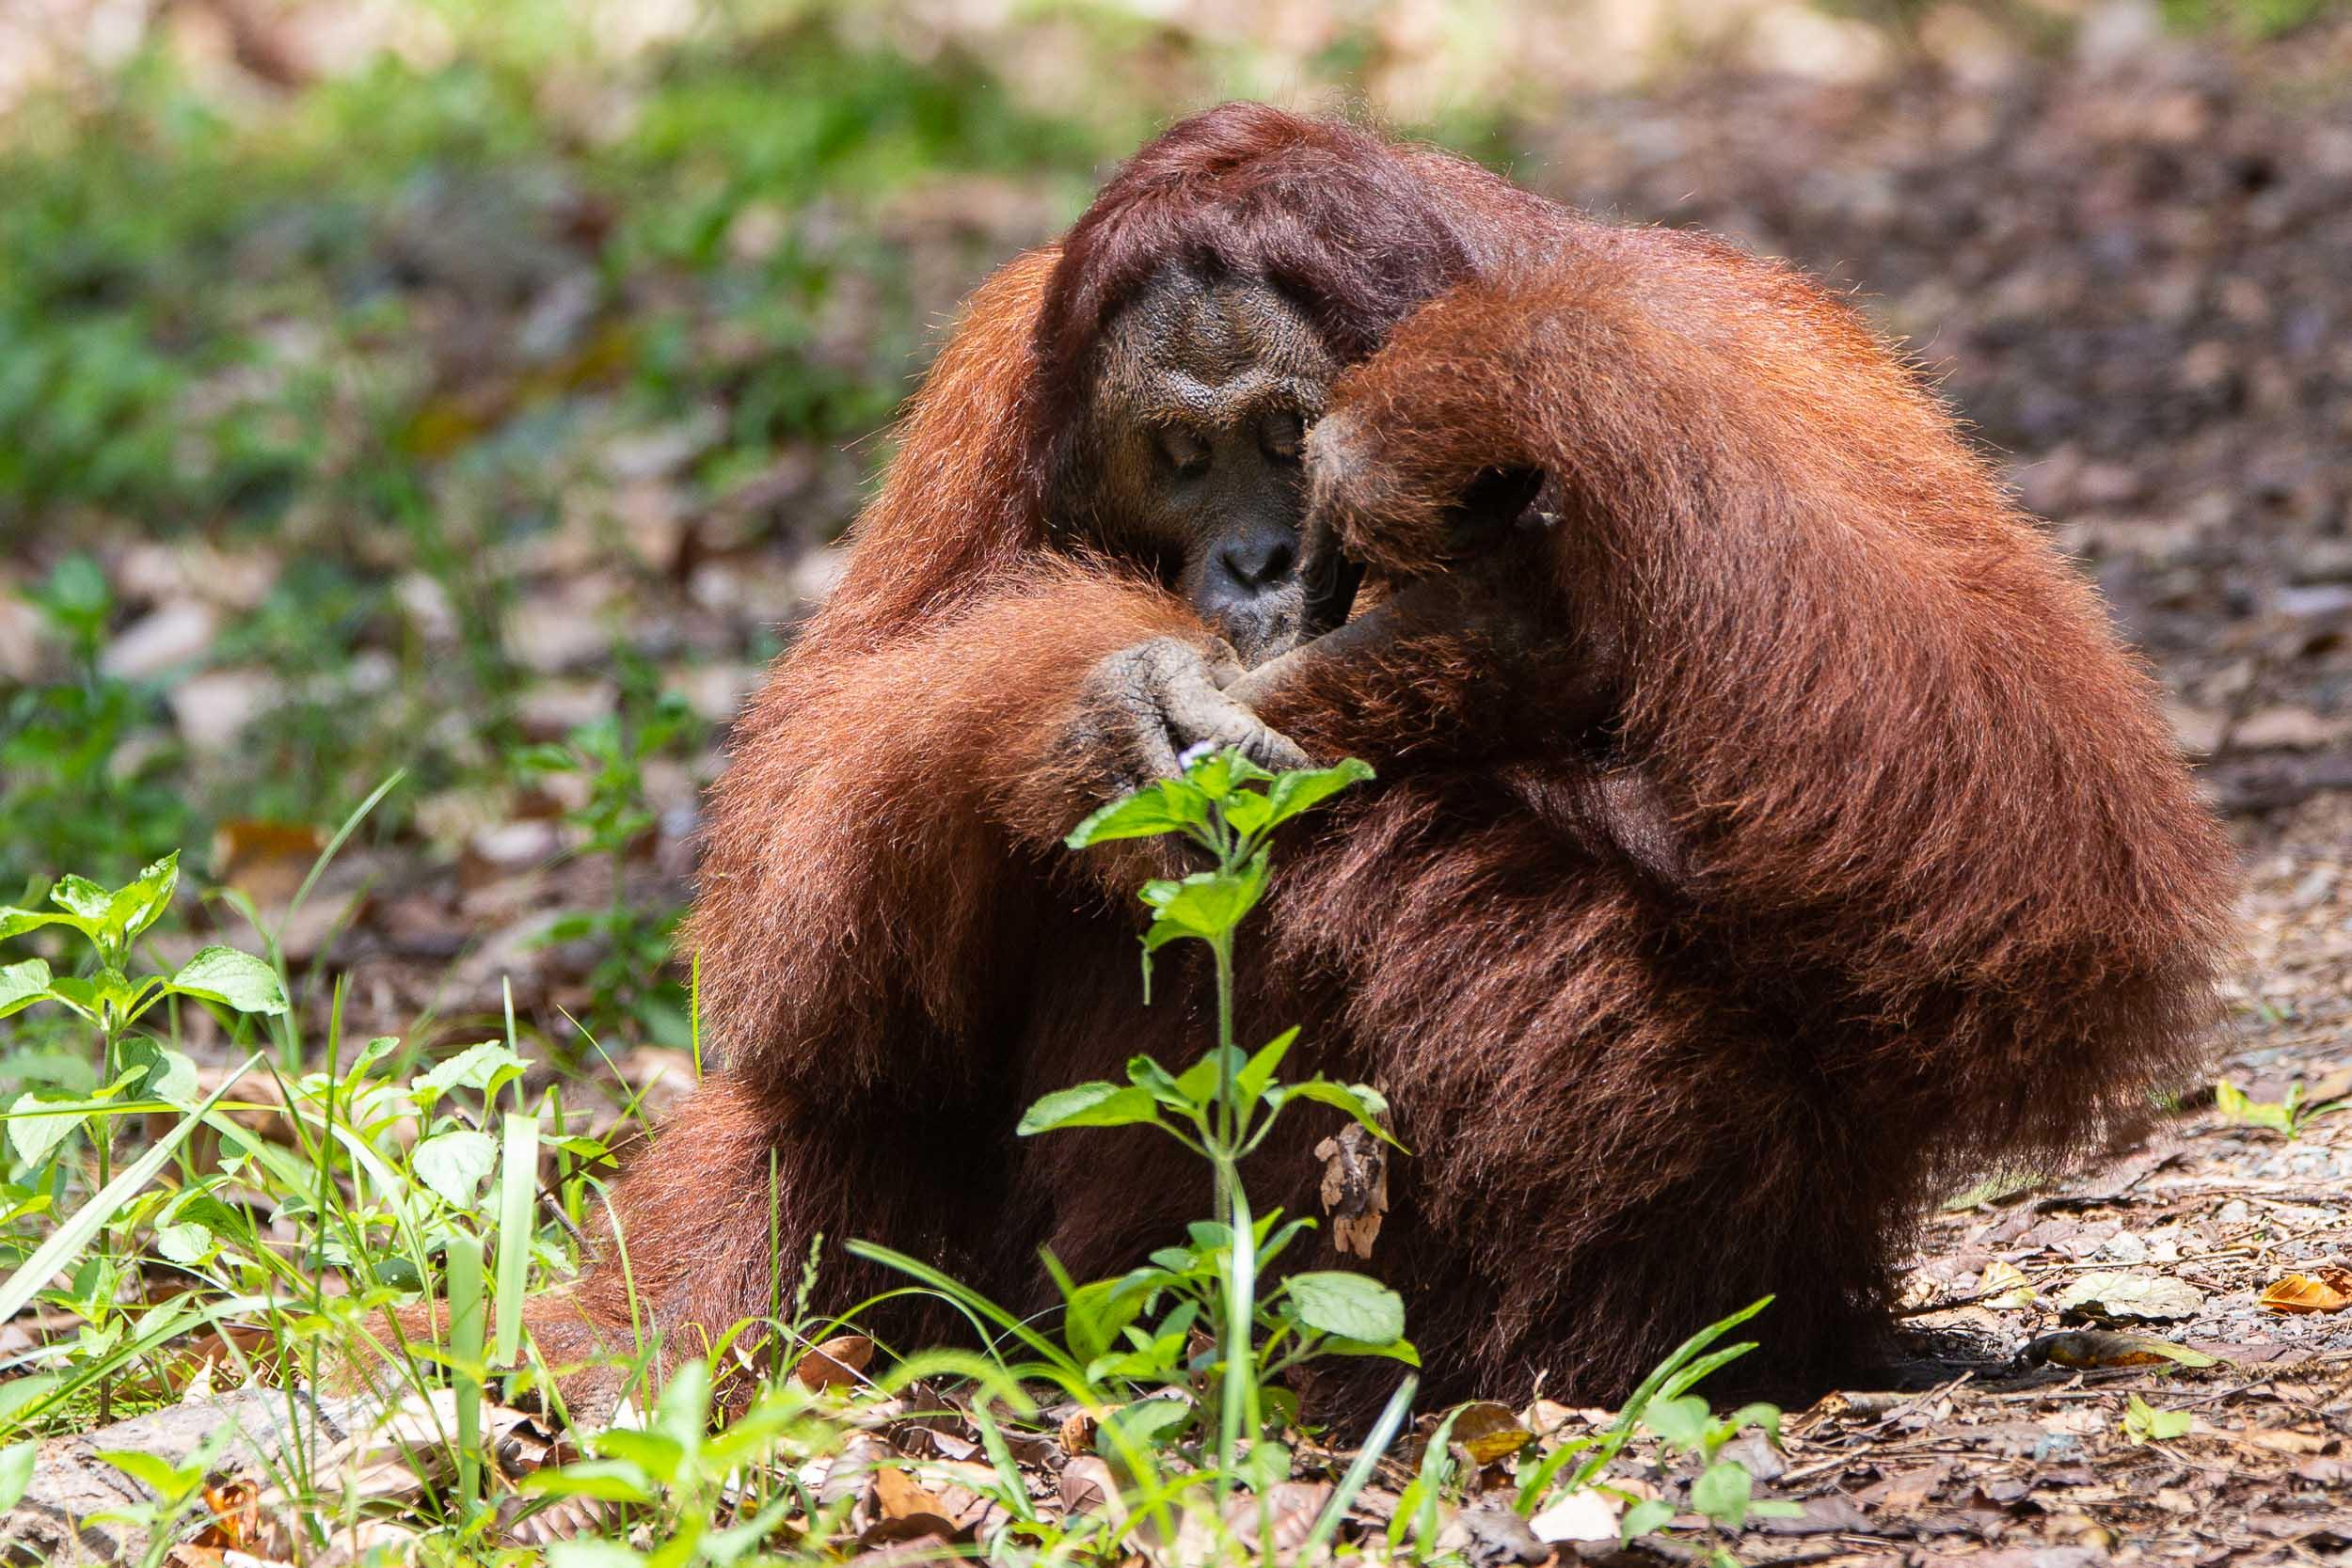 Large Male Orangutan with Flanged Cheeks sitting, Danum Valley, Sabah, Borneo, Malaysia (2).jpg